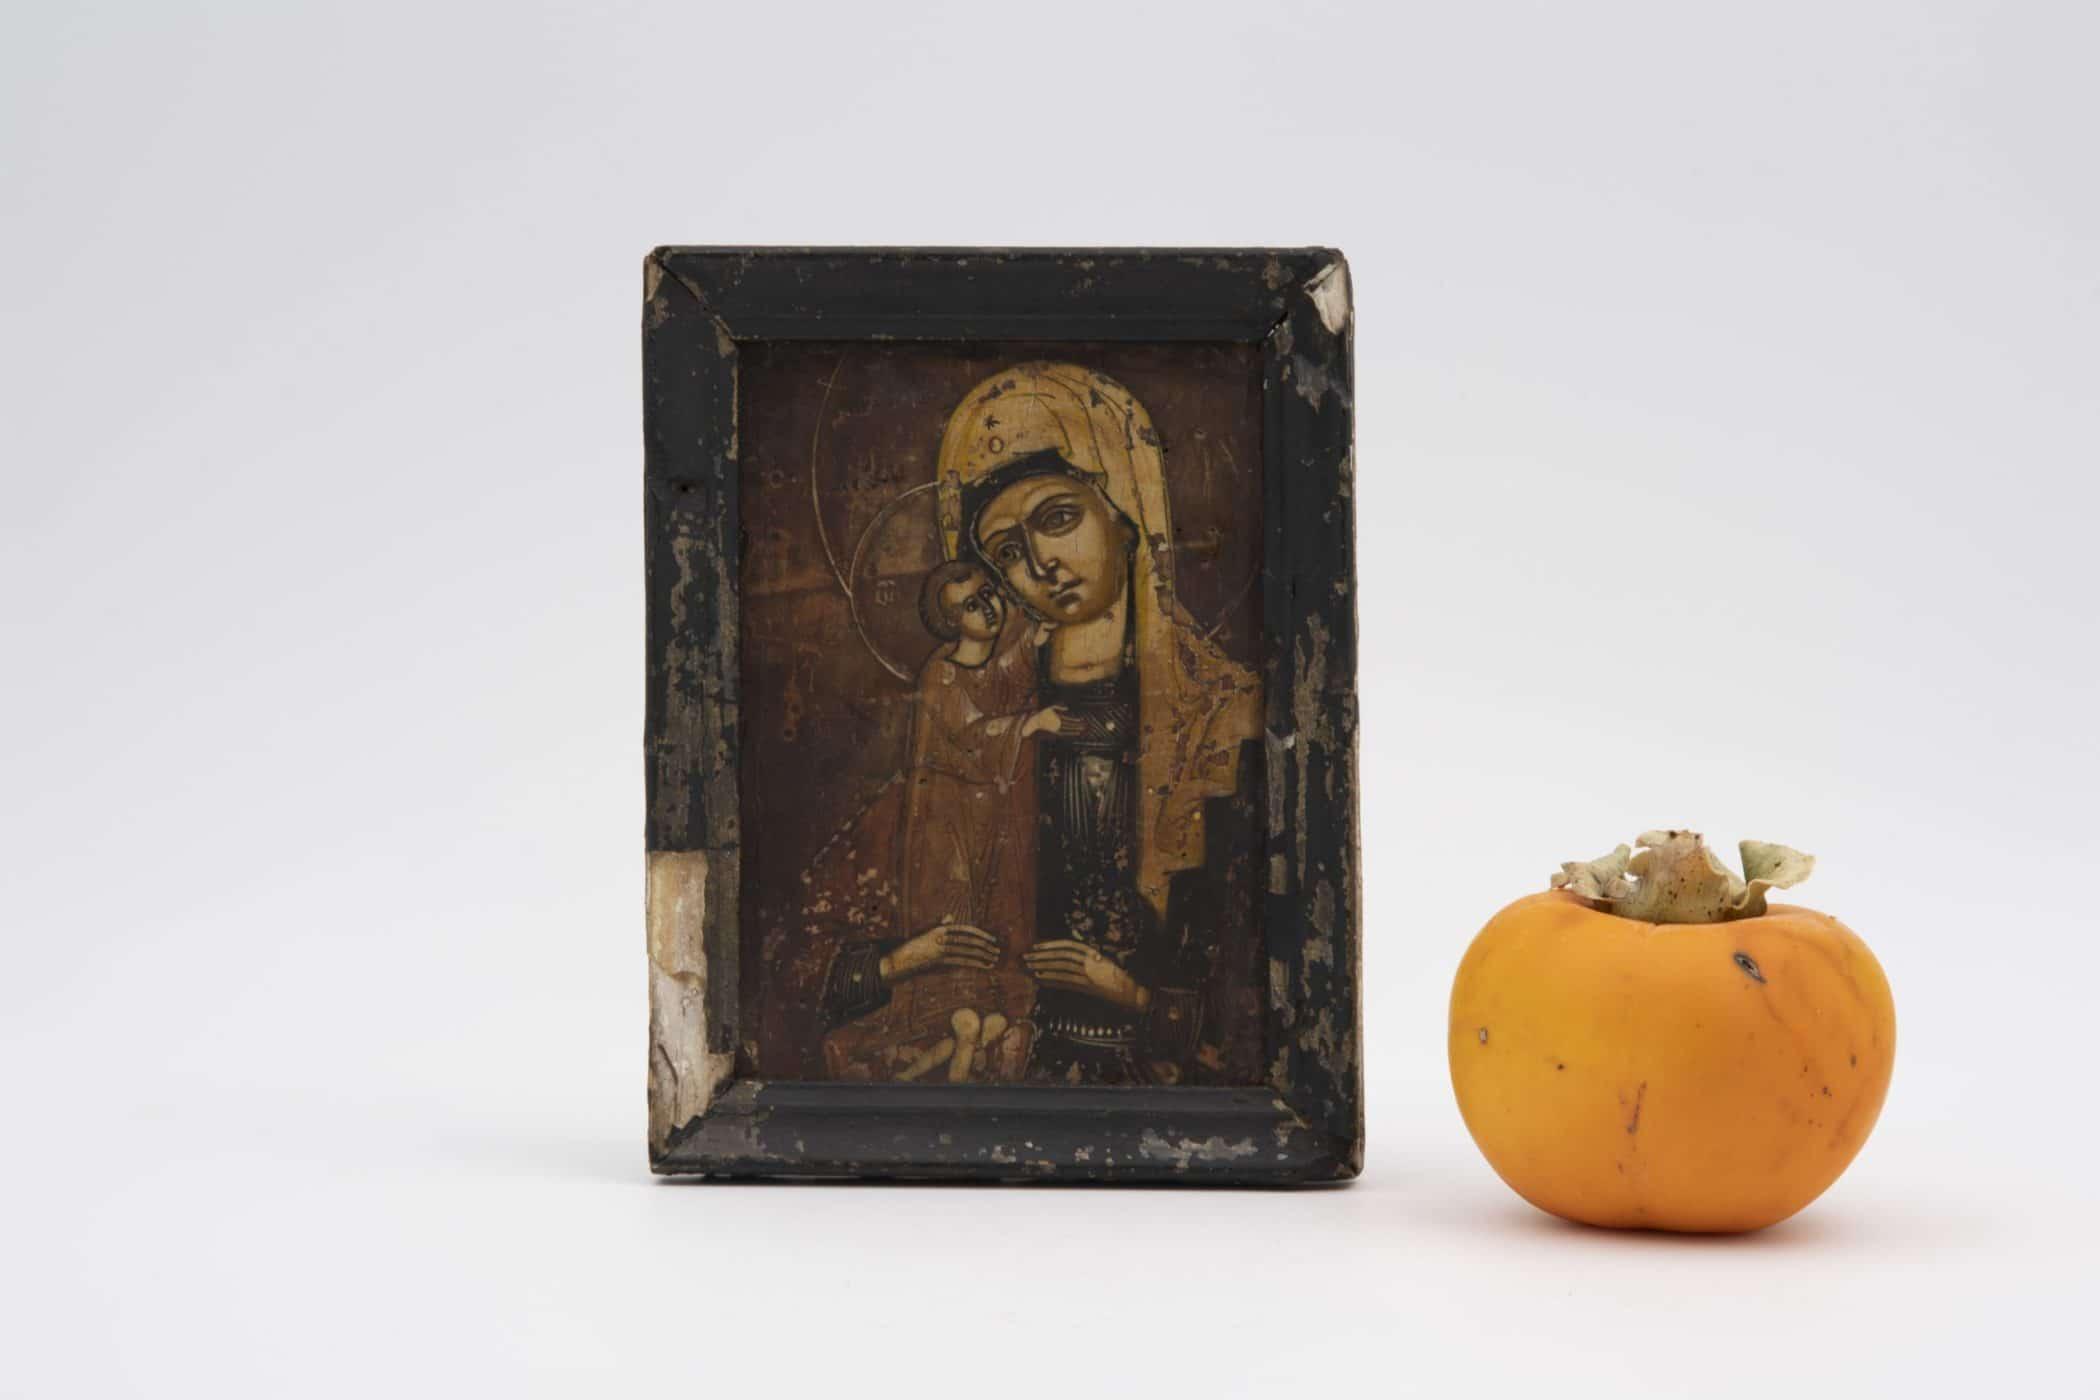 Icône russe sur bois, XVIIIe siècle.